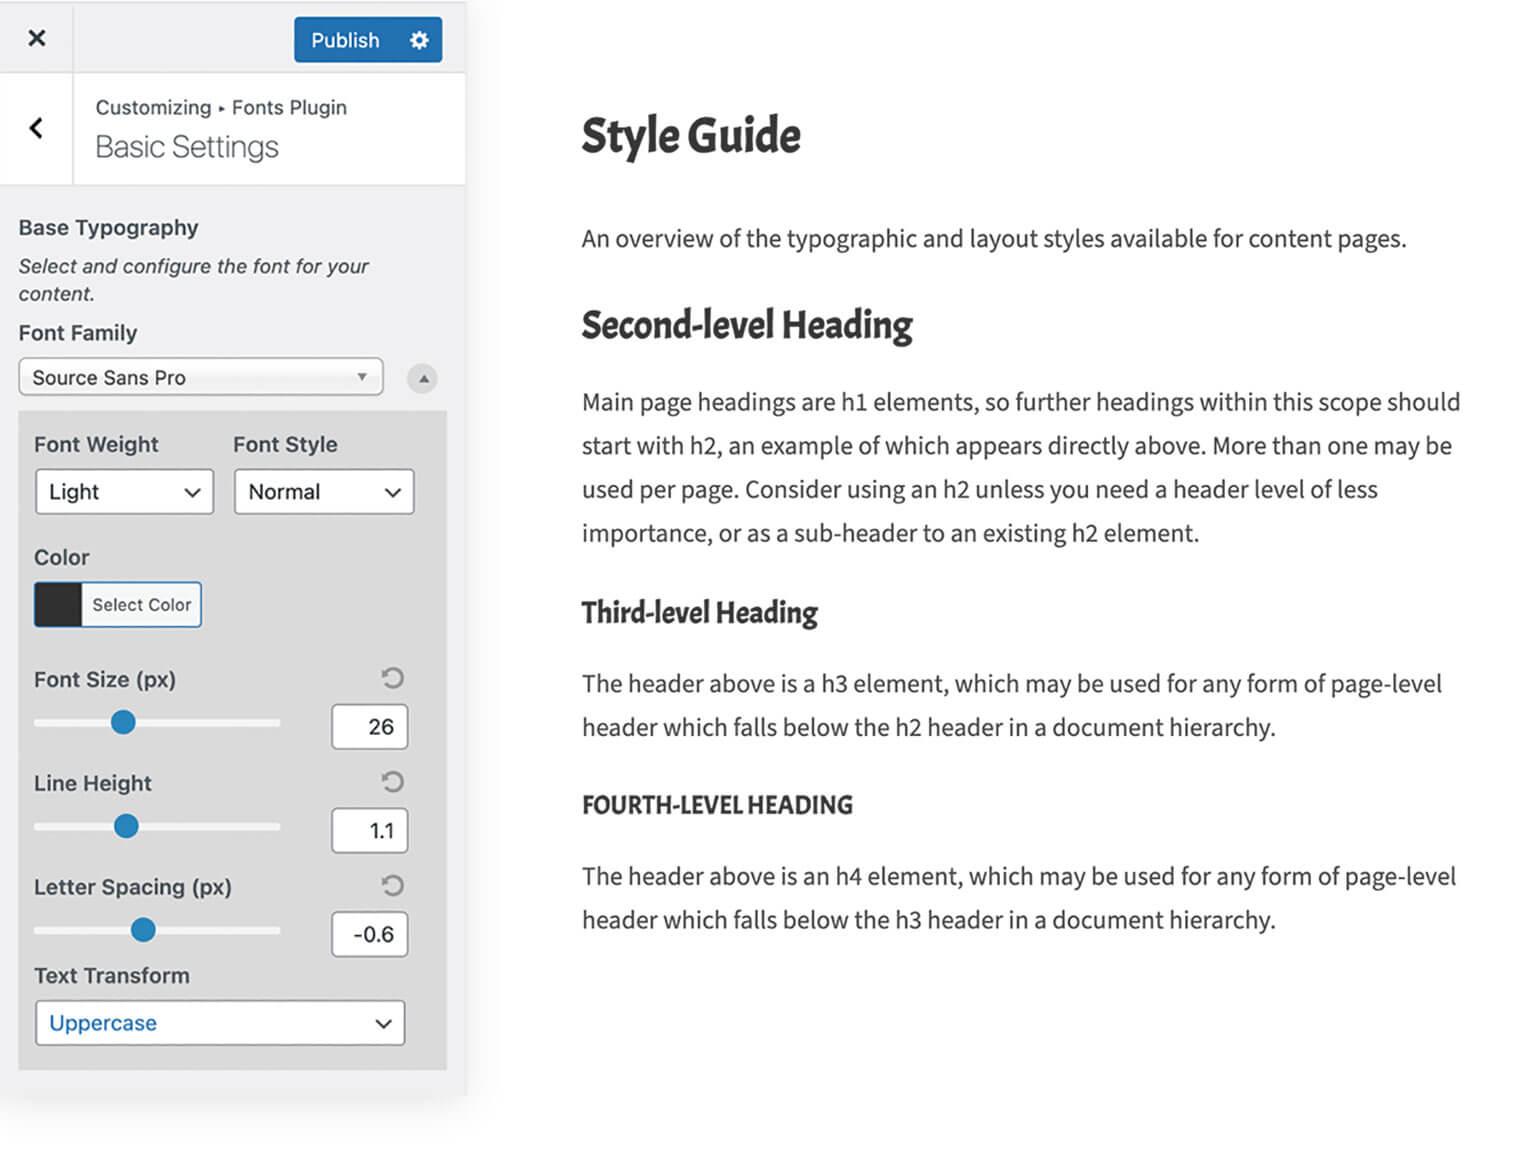 Fonts plugin to change fonts in WordPress